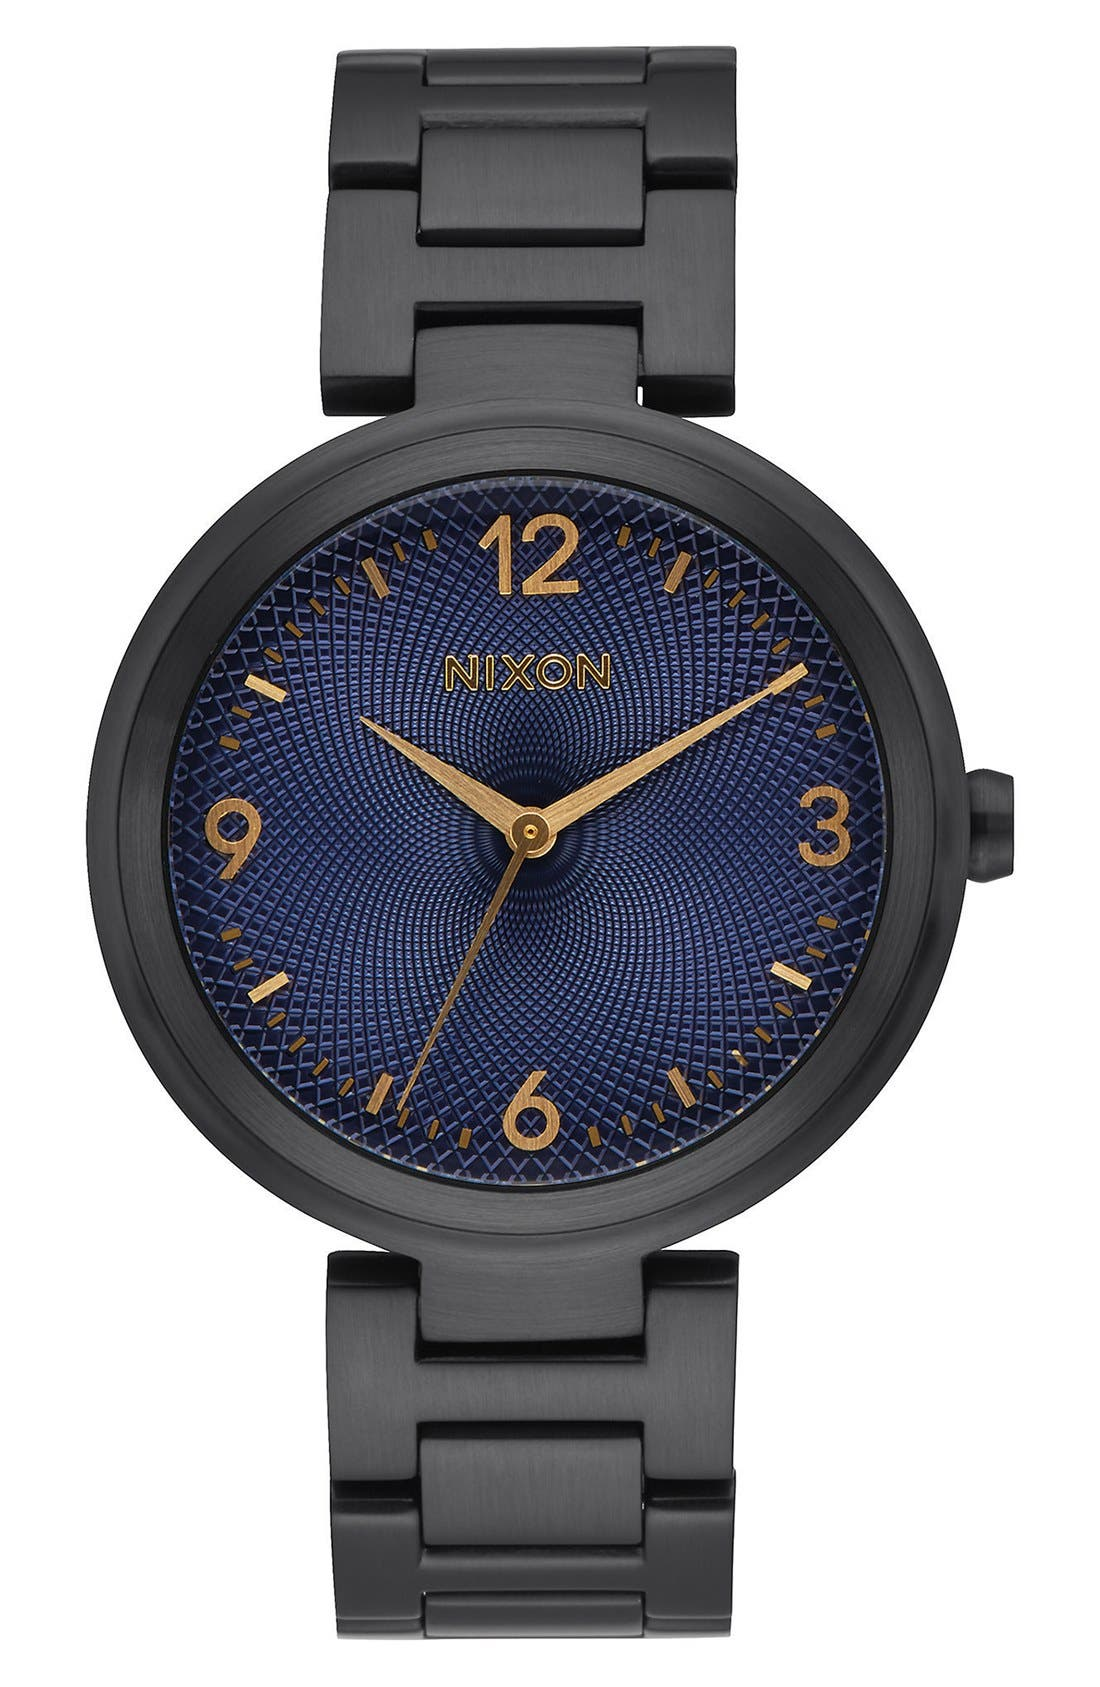 NIXON Chameleon Bracelet Watch, 39mm